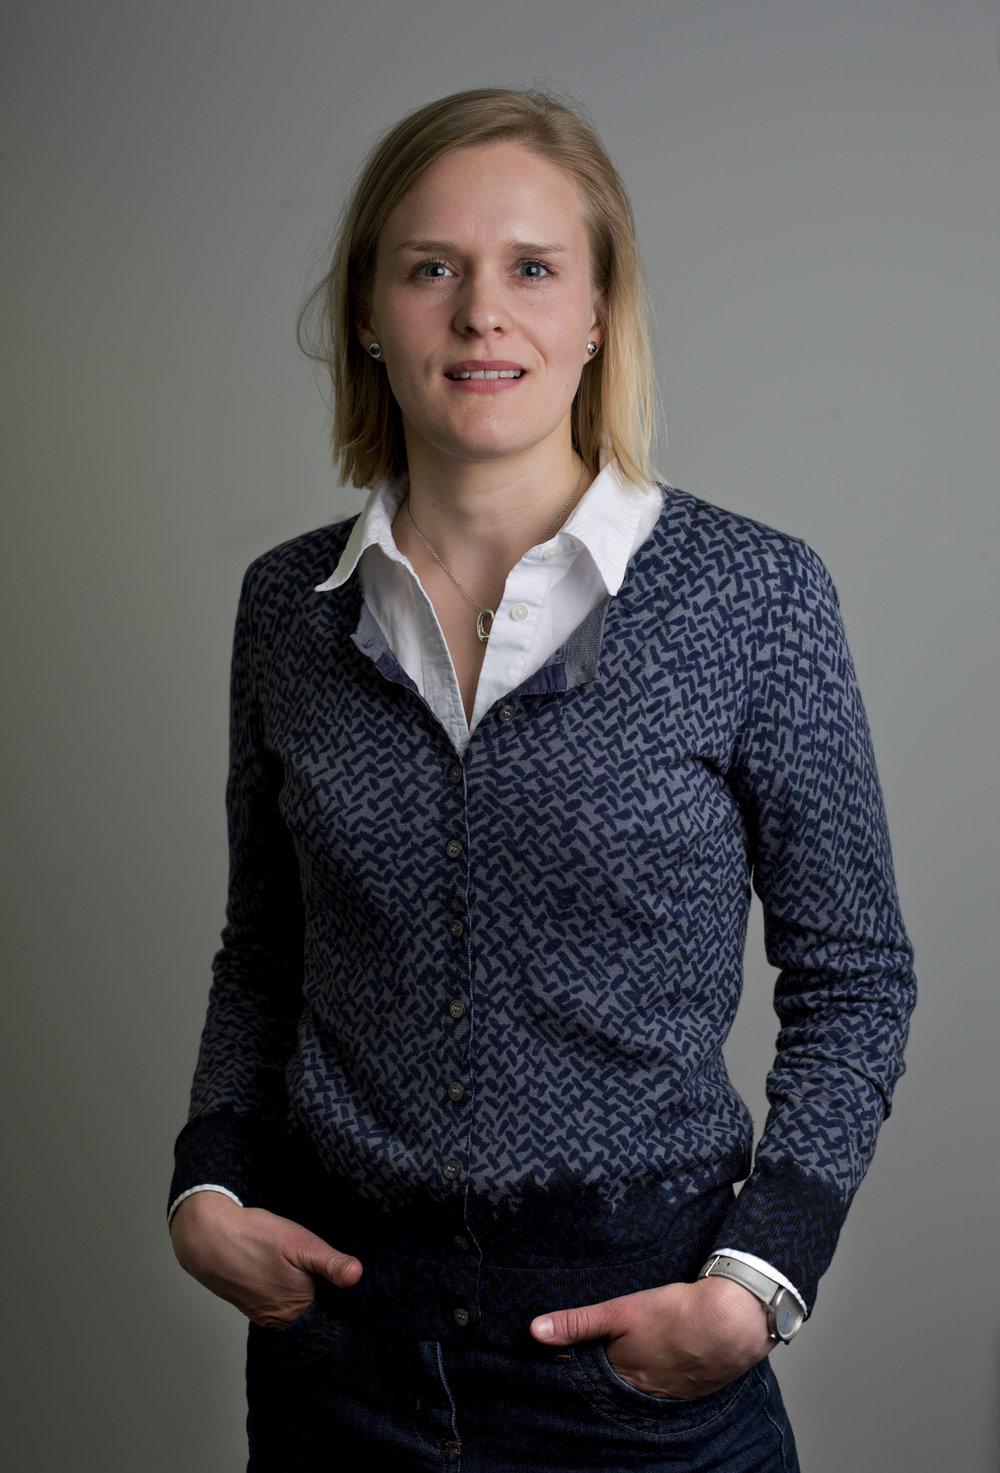 Laura Battle